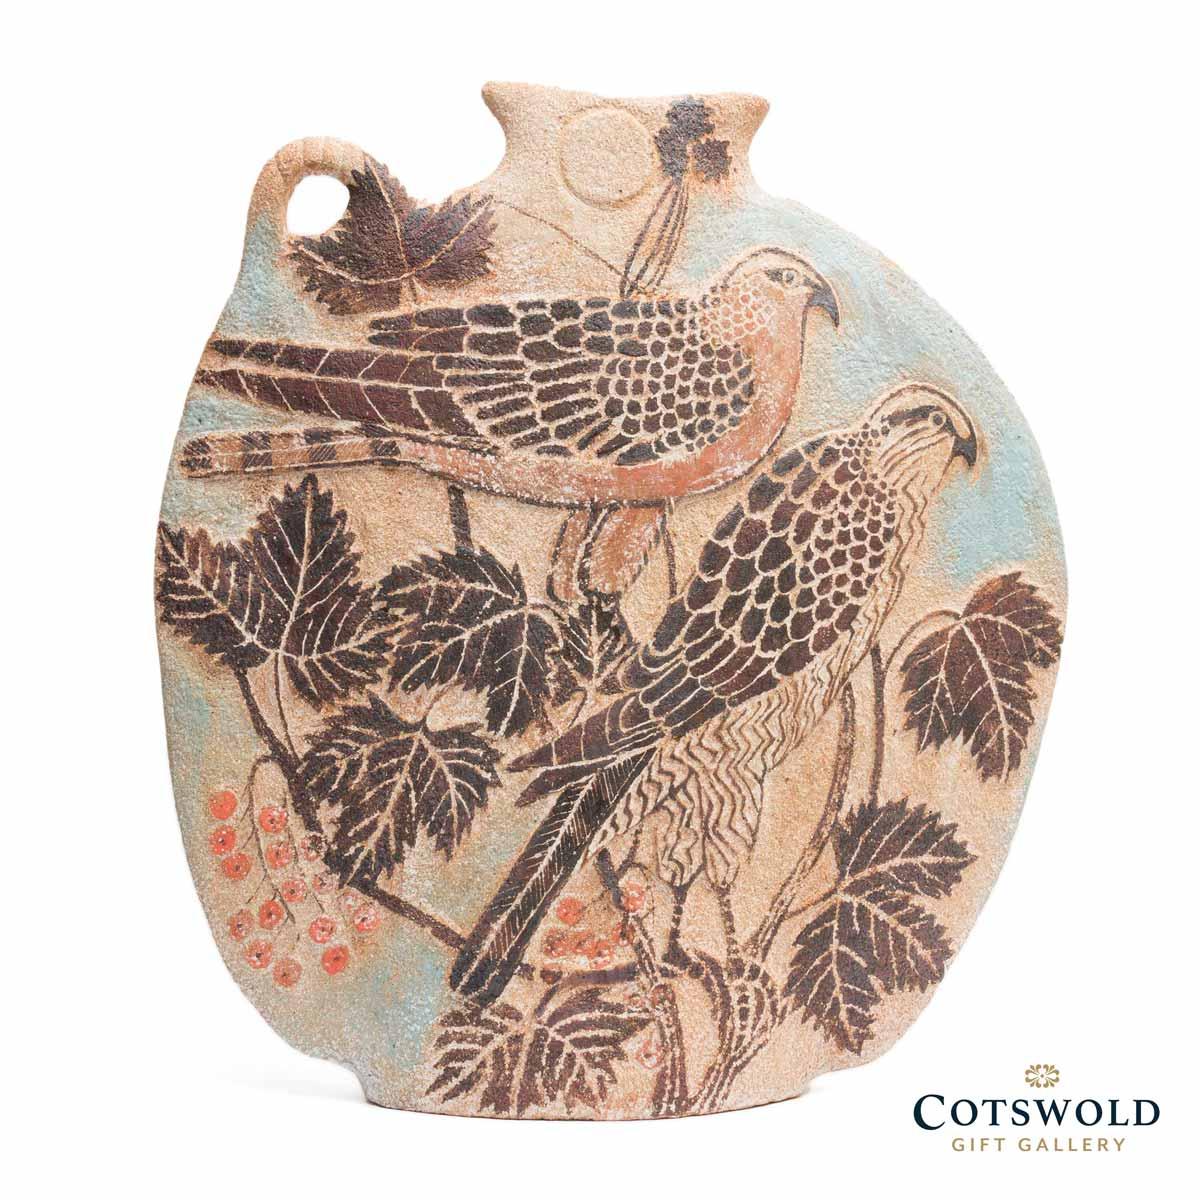 Michele Cowmeadow Hawks Slab Vase 1